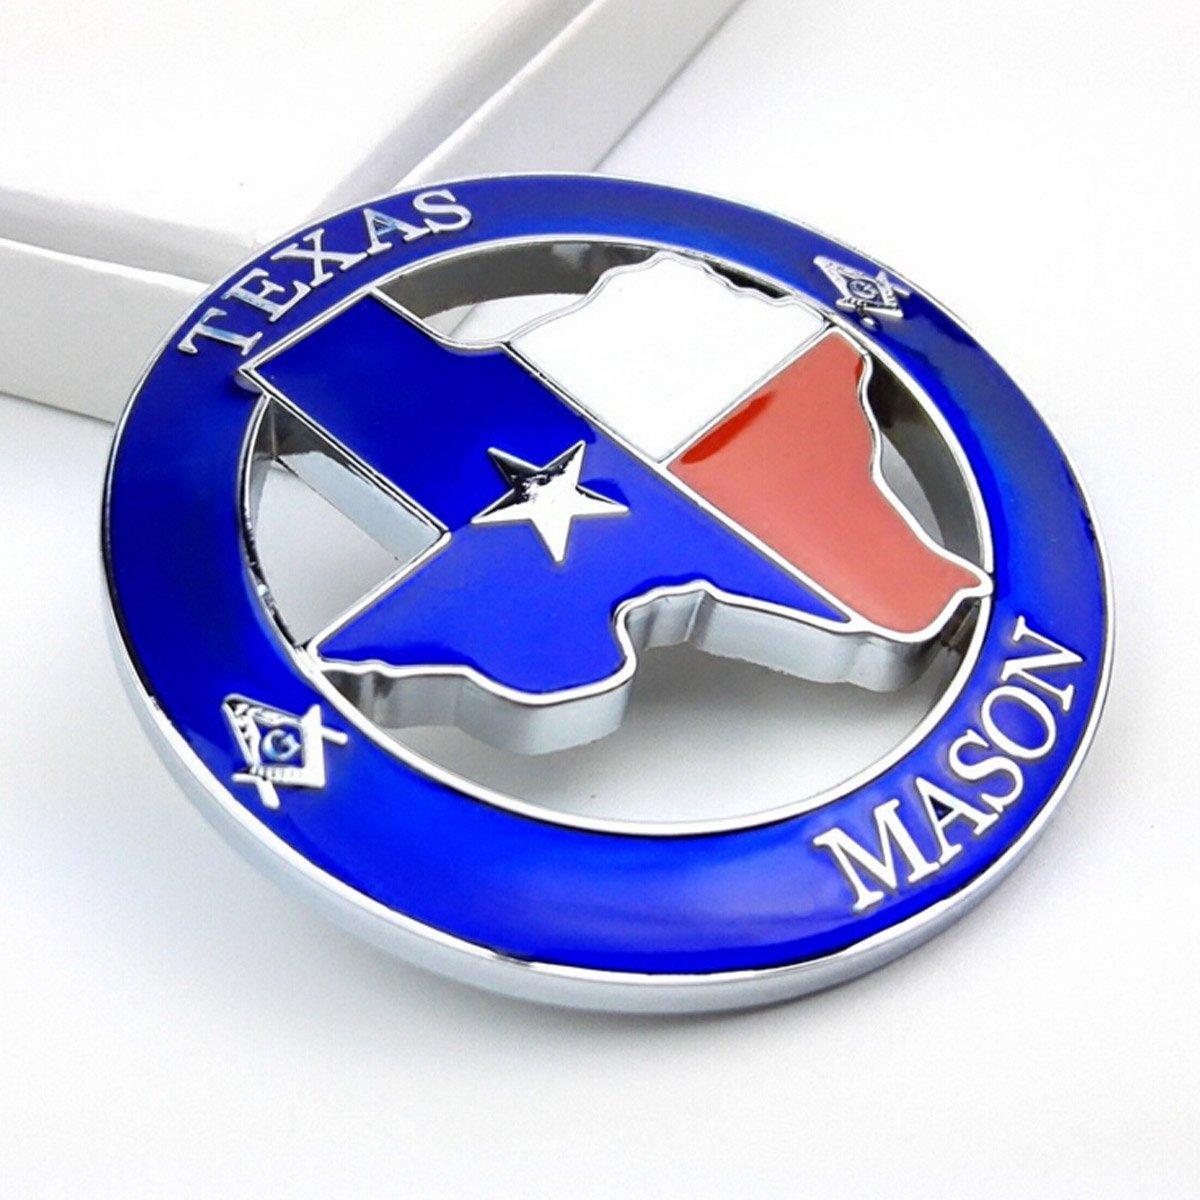 Cheap Master Mason Emblem Find Master Mason Emblem Deals On Line At